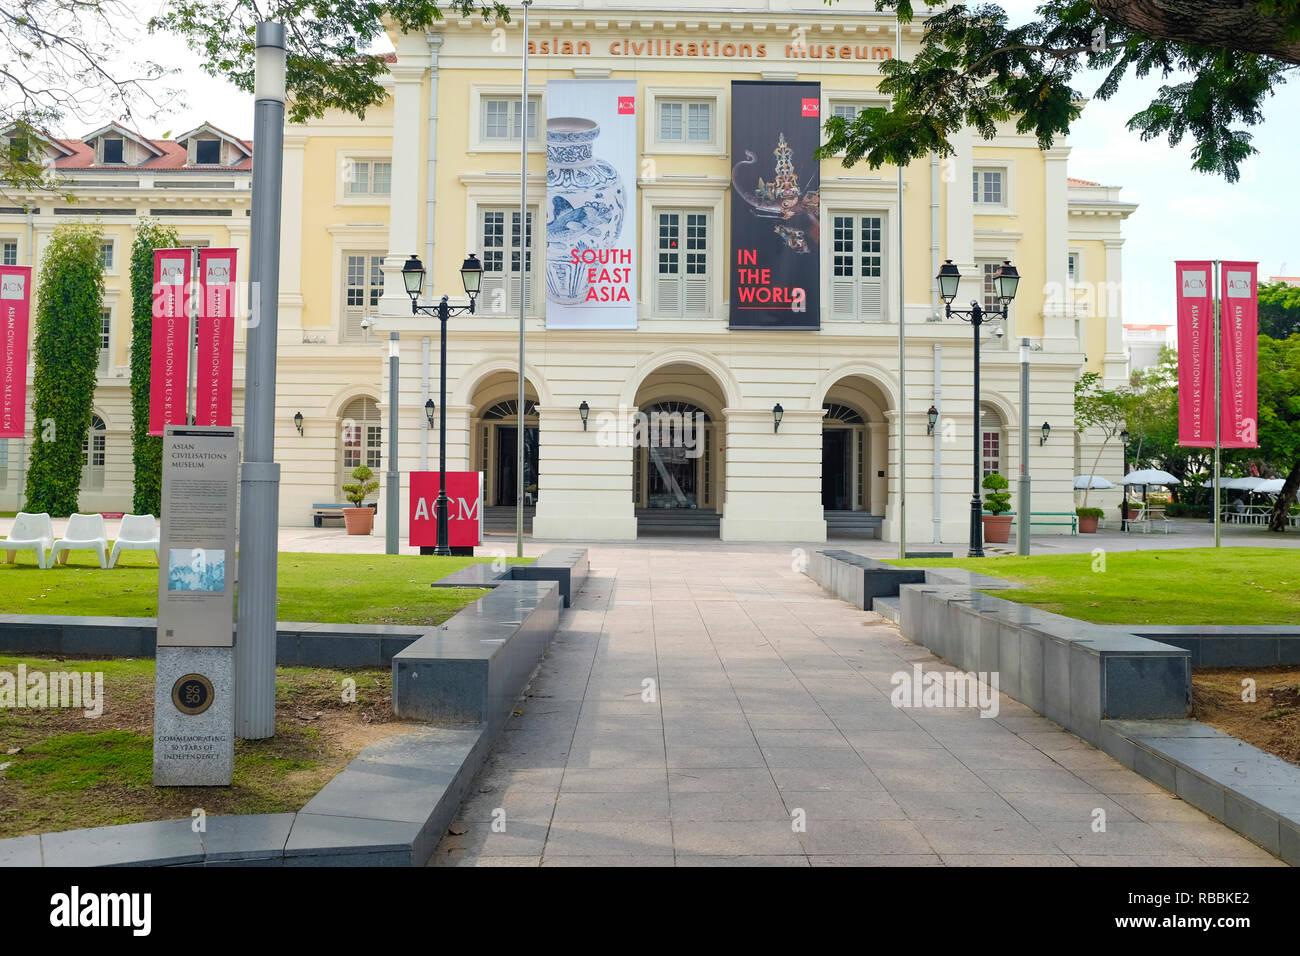 Asian Civilisations Museum (ACM), Empress Place, Civic District, Singapore Island (Pulau Ujong), Singapore. - Stock Image